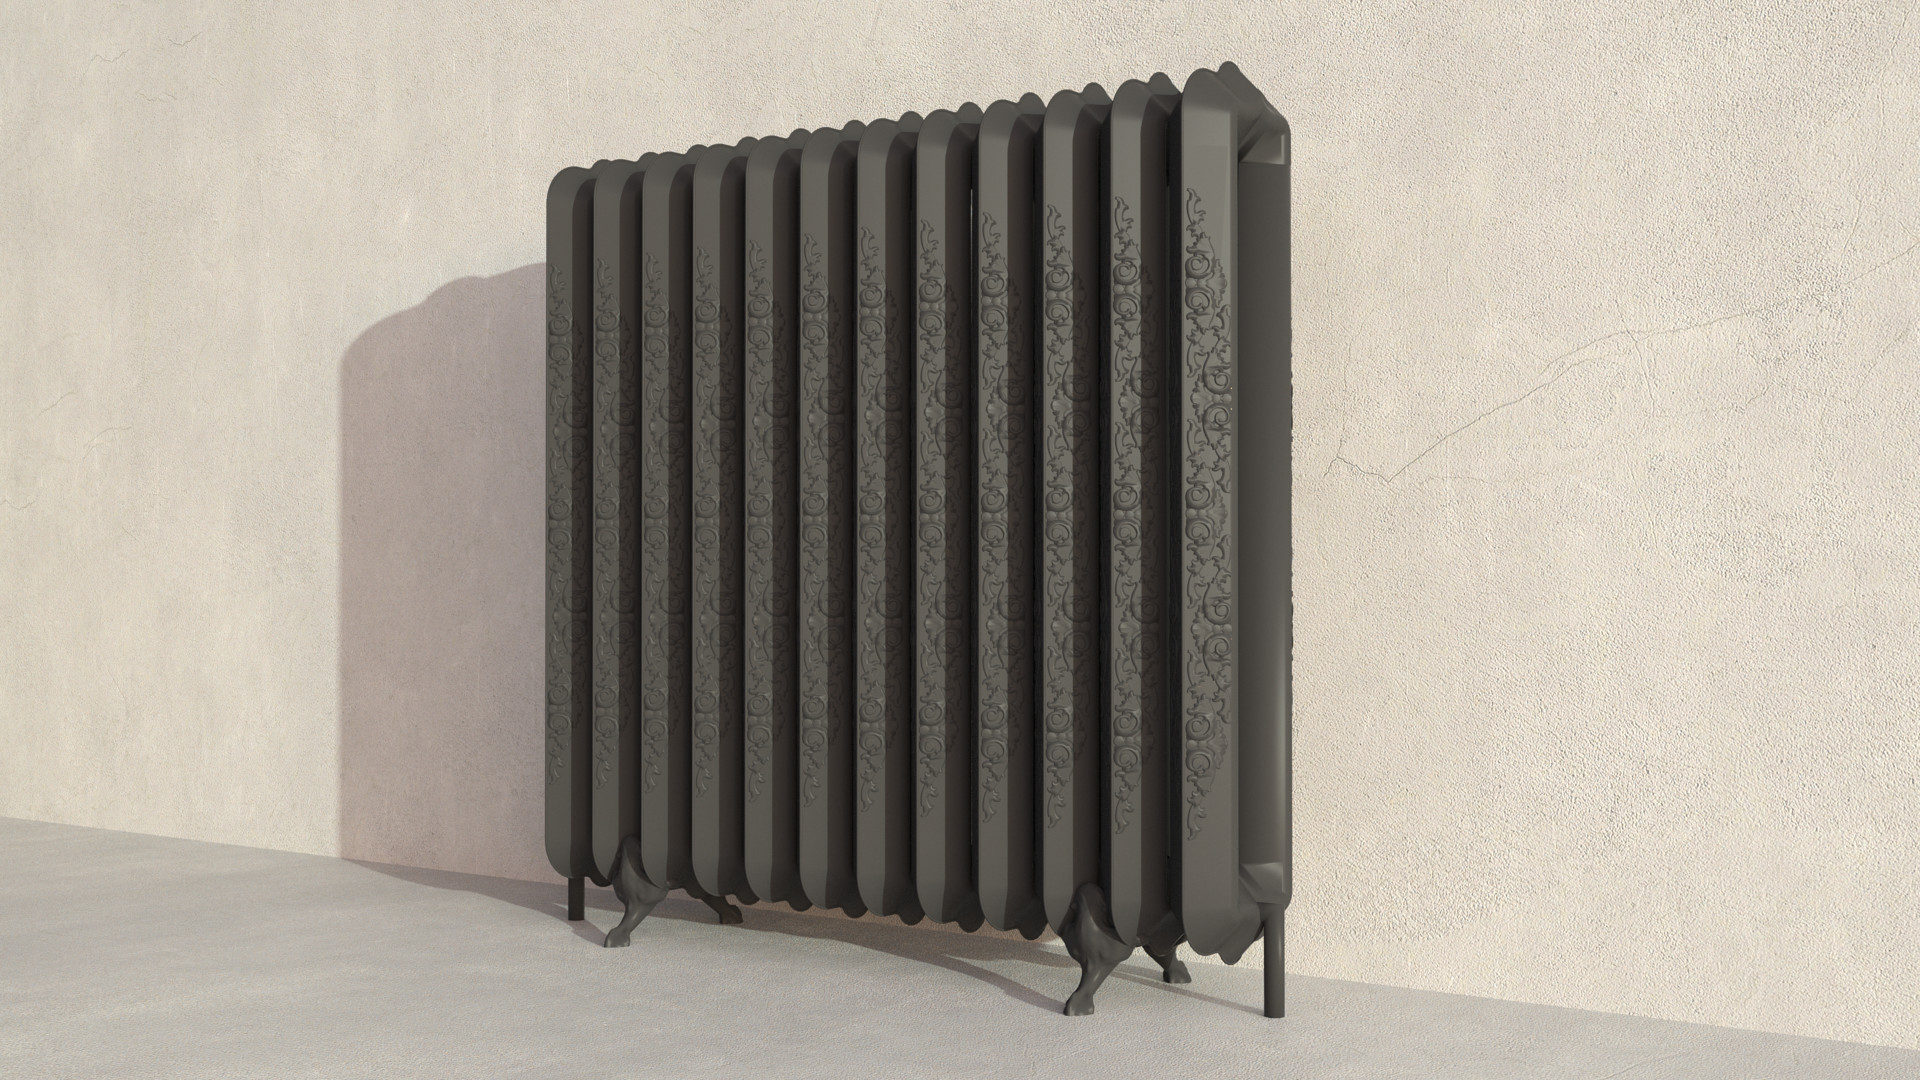 Duane kemp cast iron radiator 03